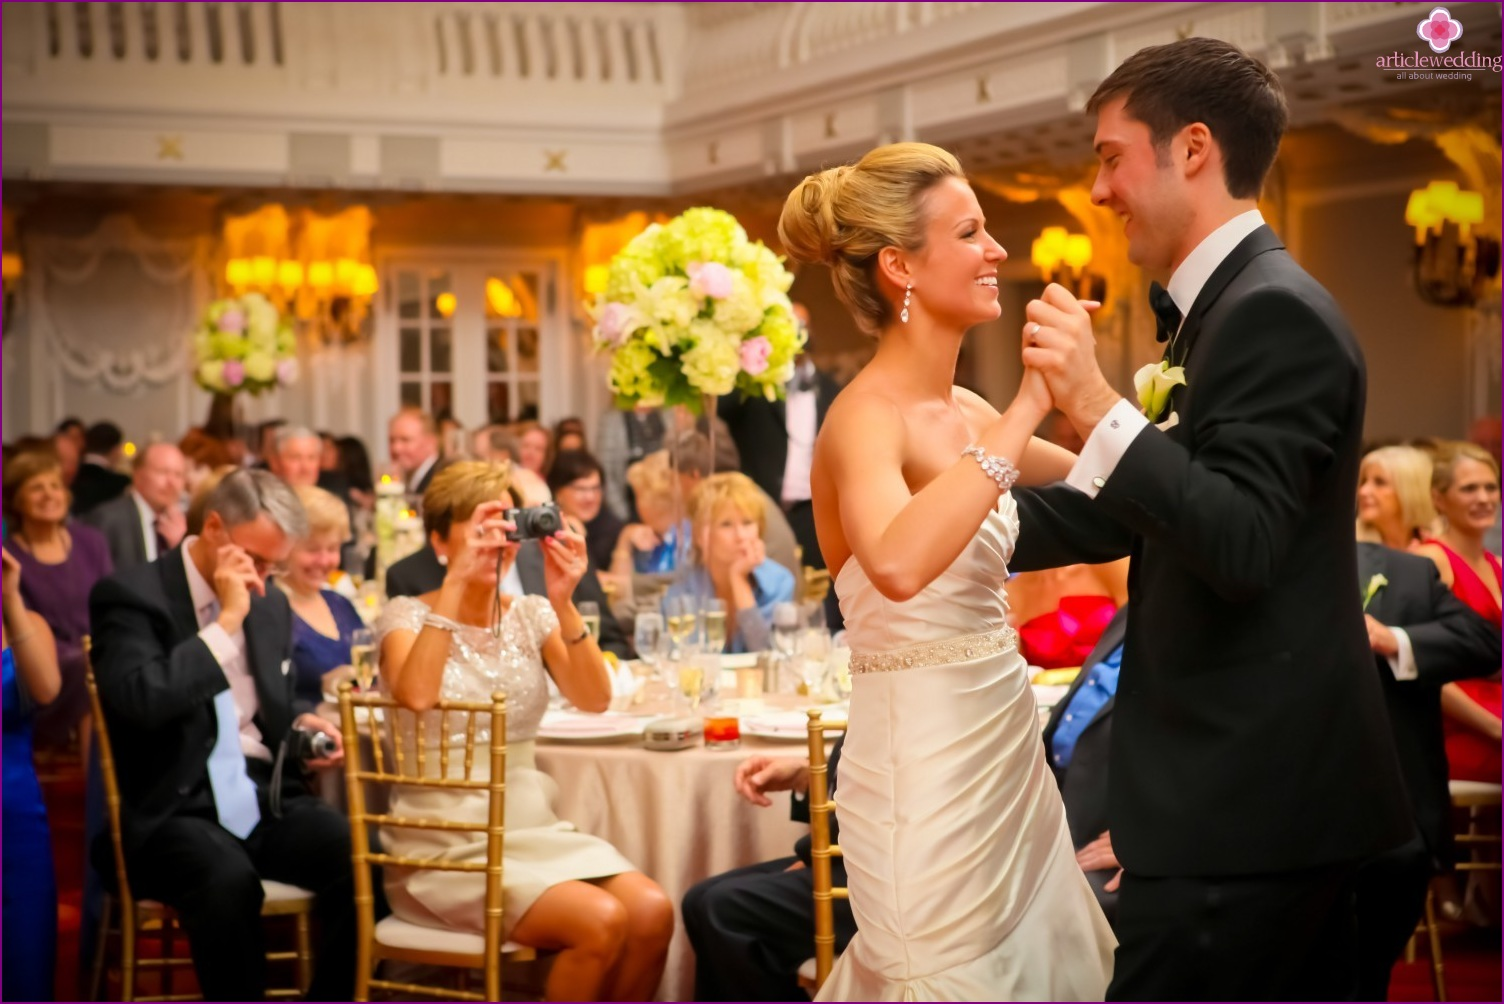 A wedding dance